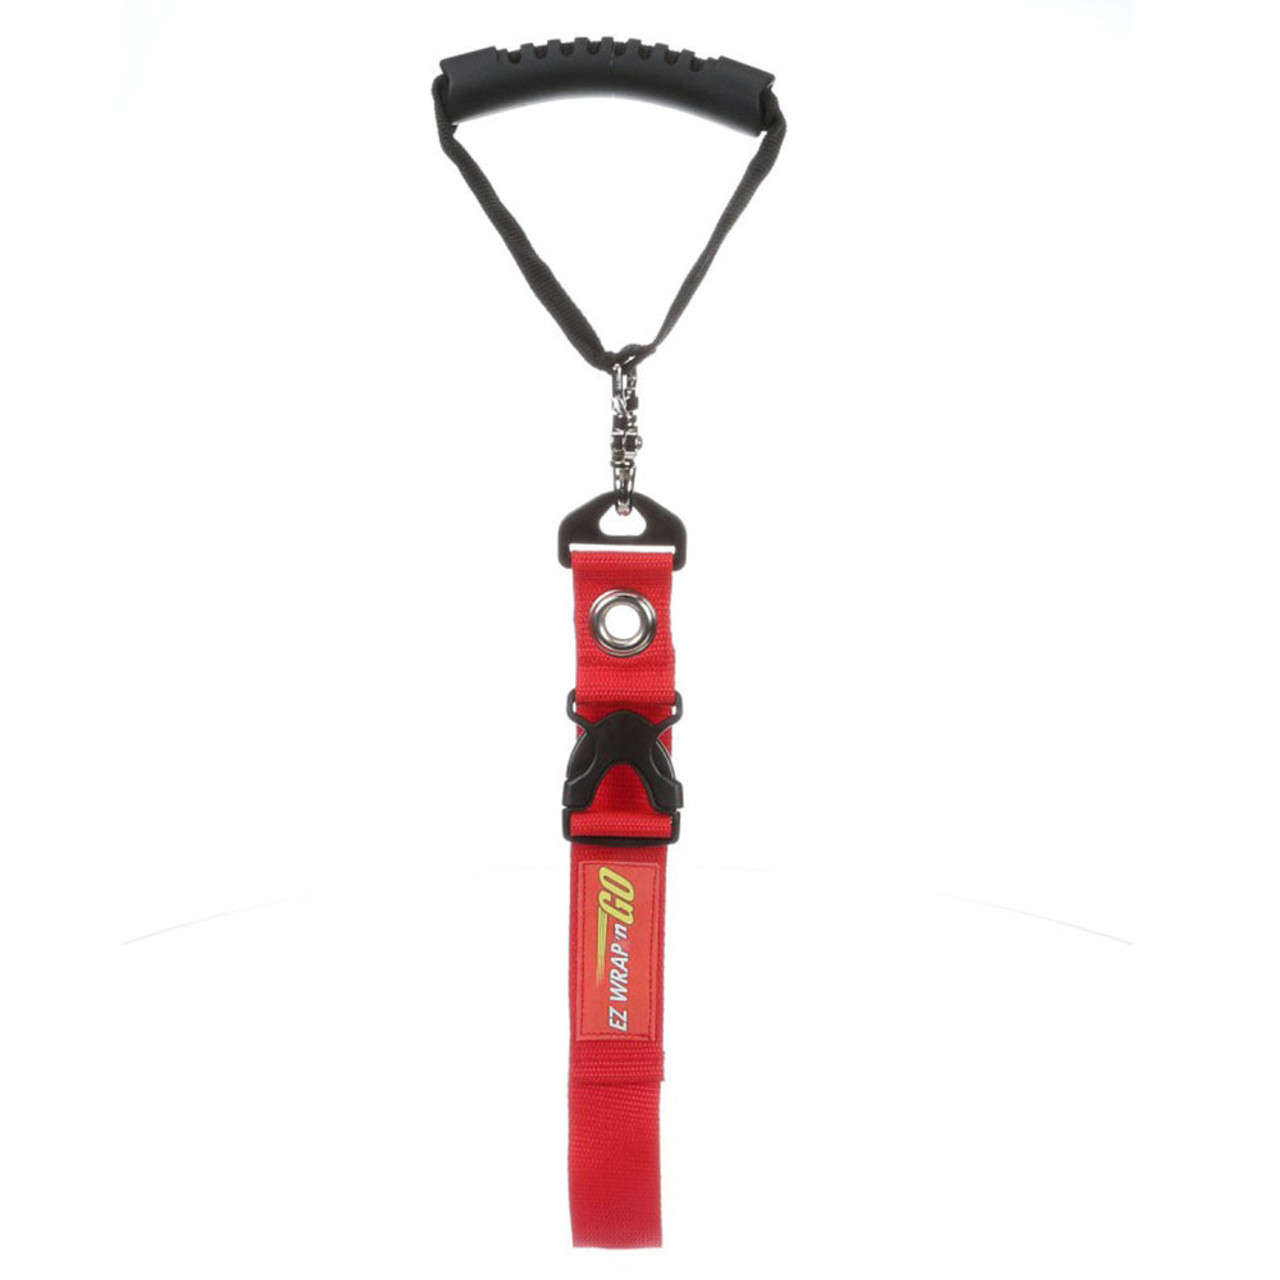 EZ Wrap 'n Go™ System / Velcro Straps - Bundling Straps - Velcro Tie - Velcro Strap